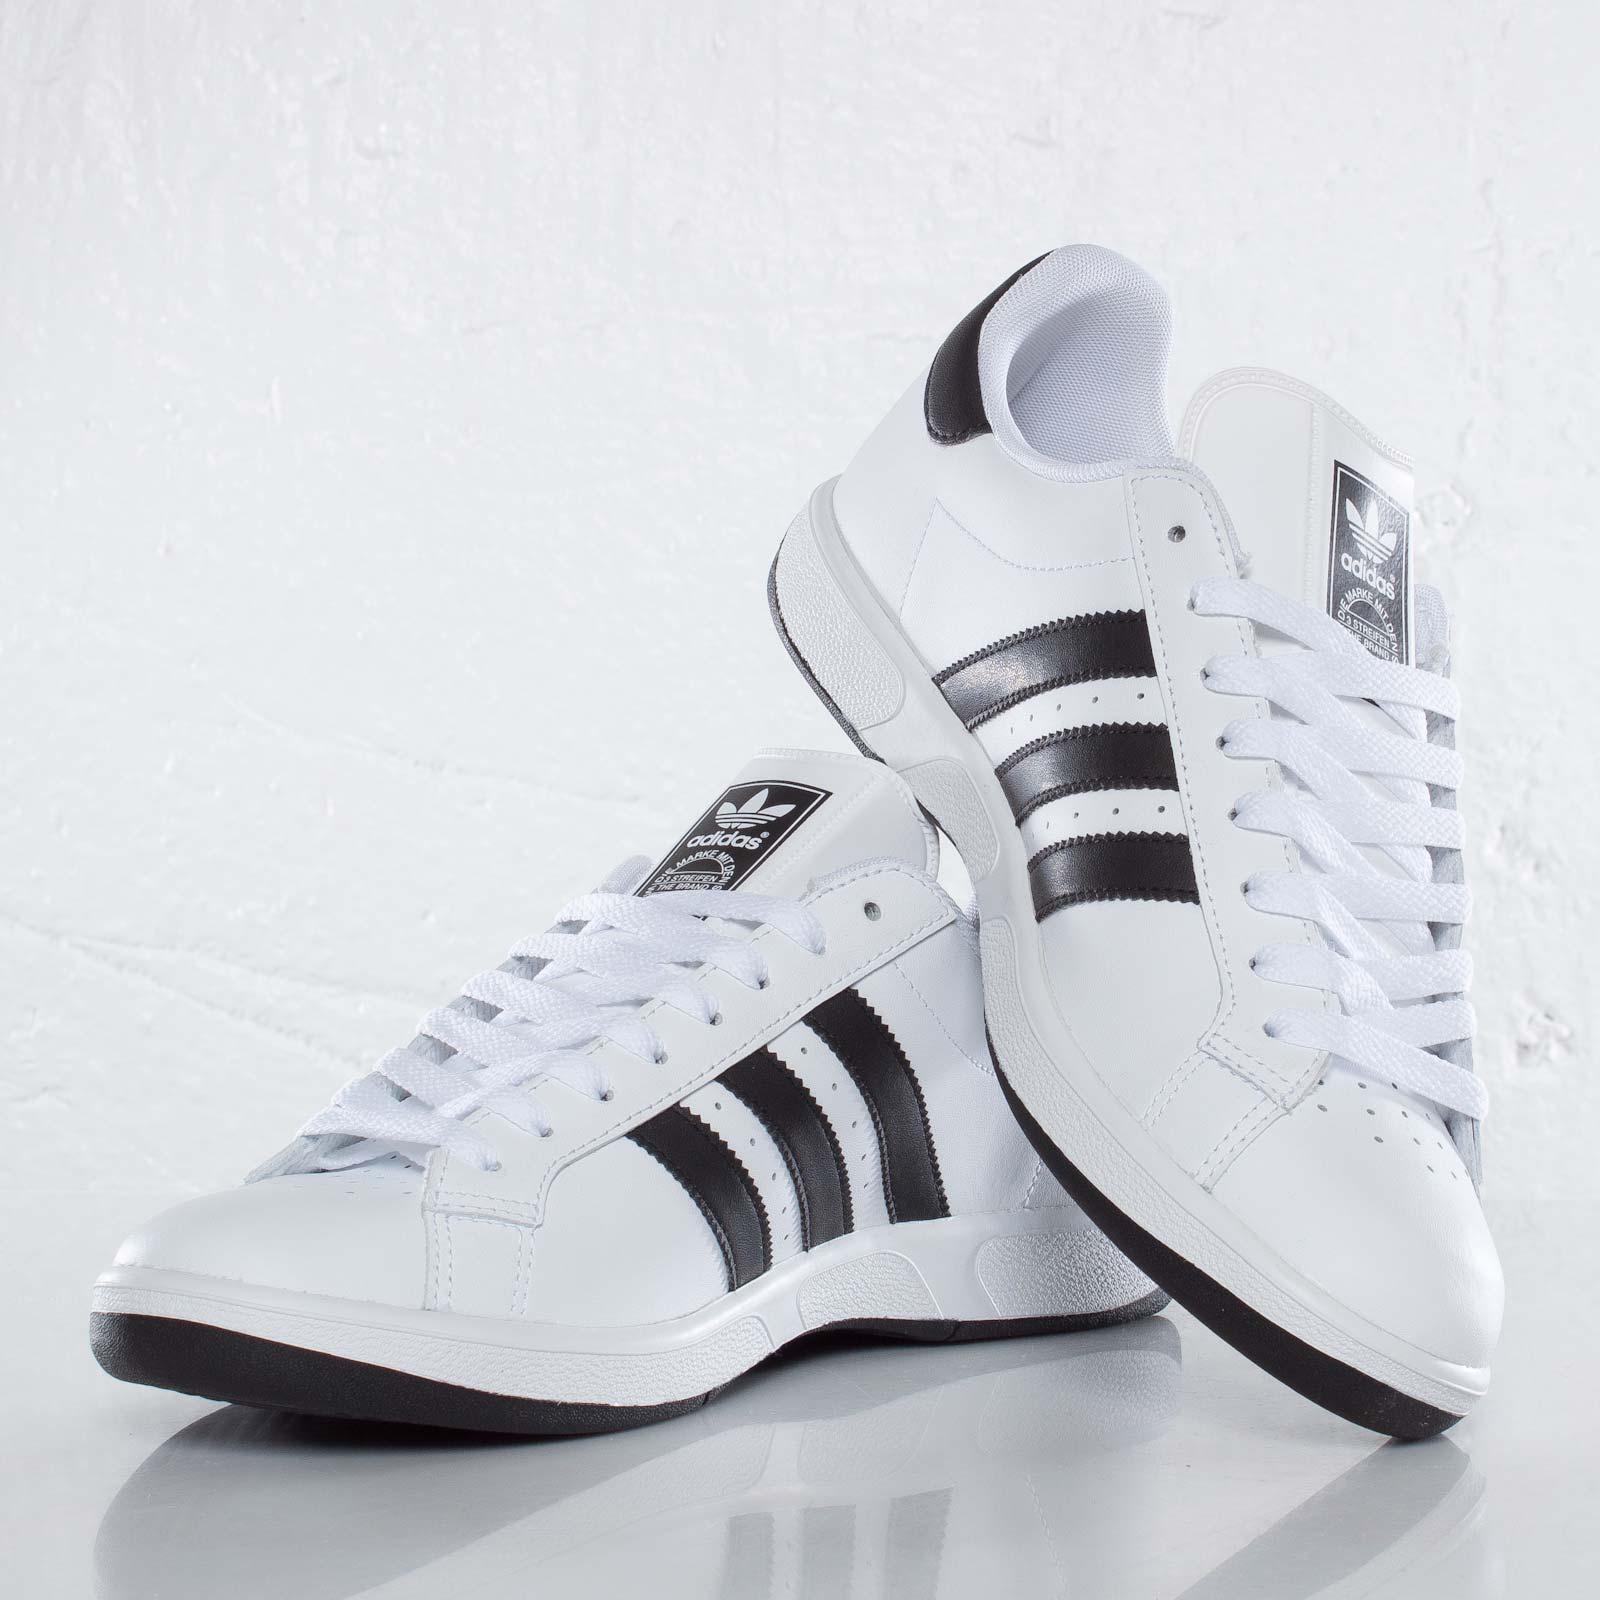 adidas Grand Prix G59935 Sneakersnstuff | sneakers